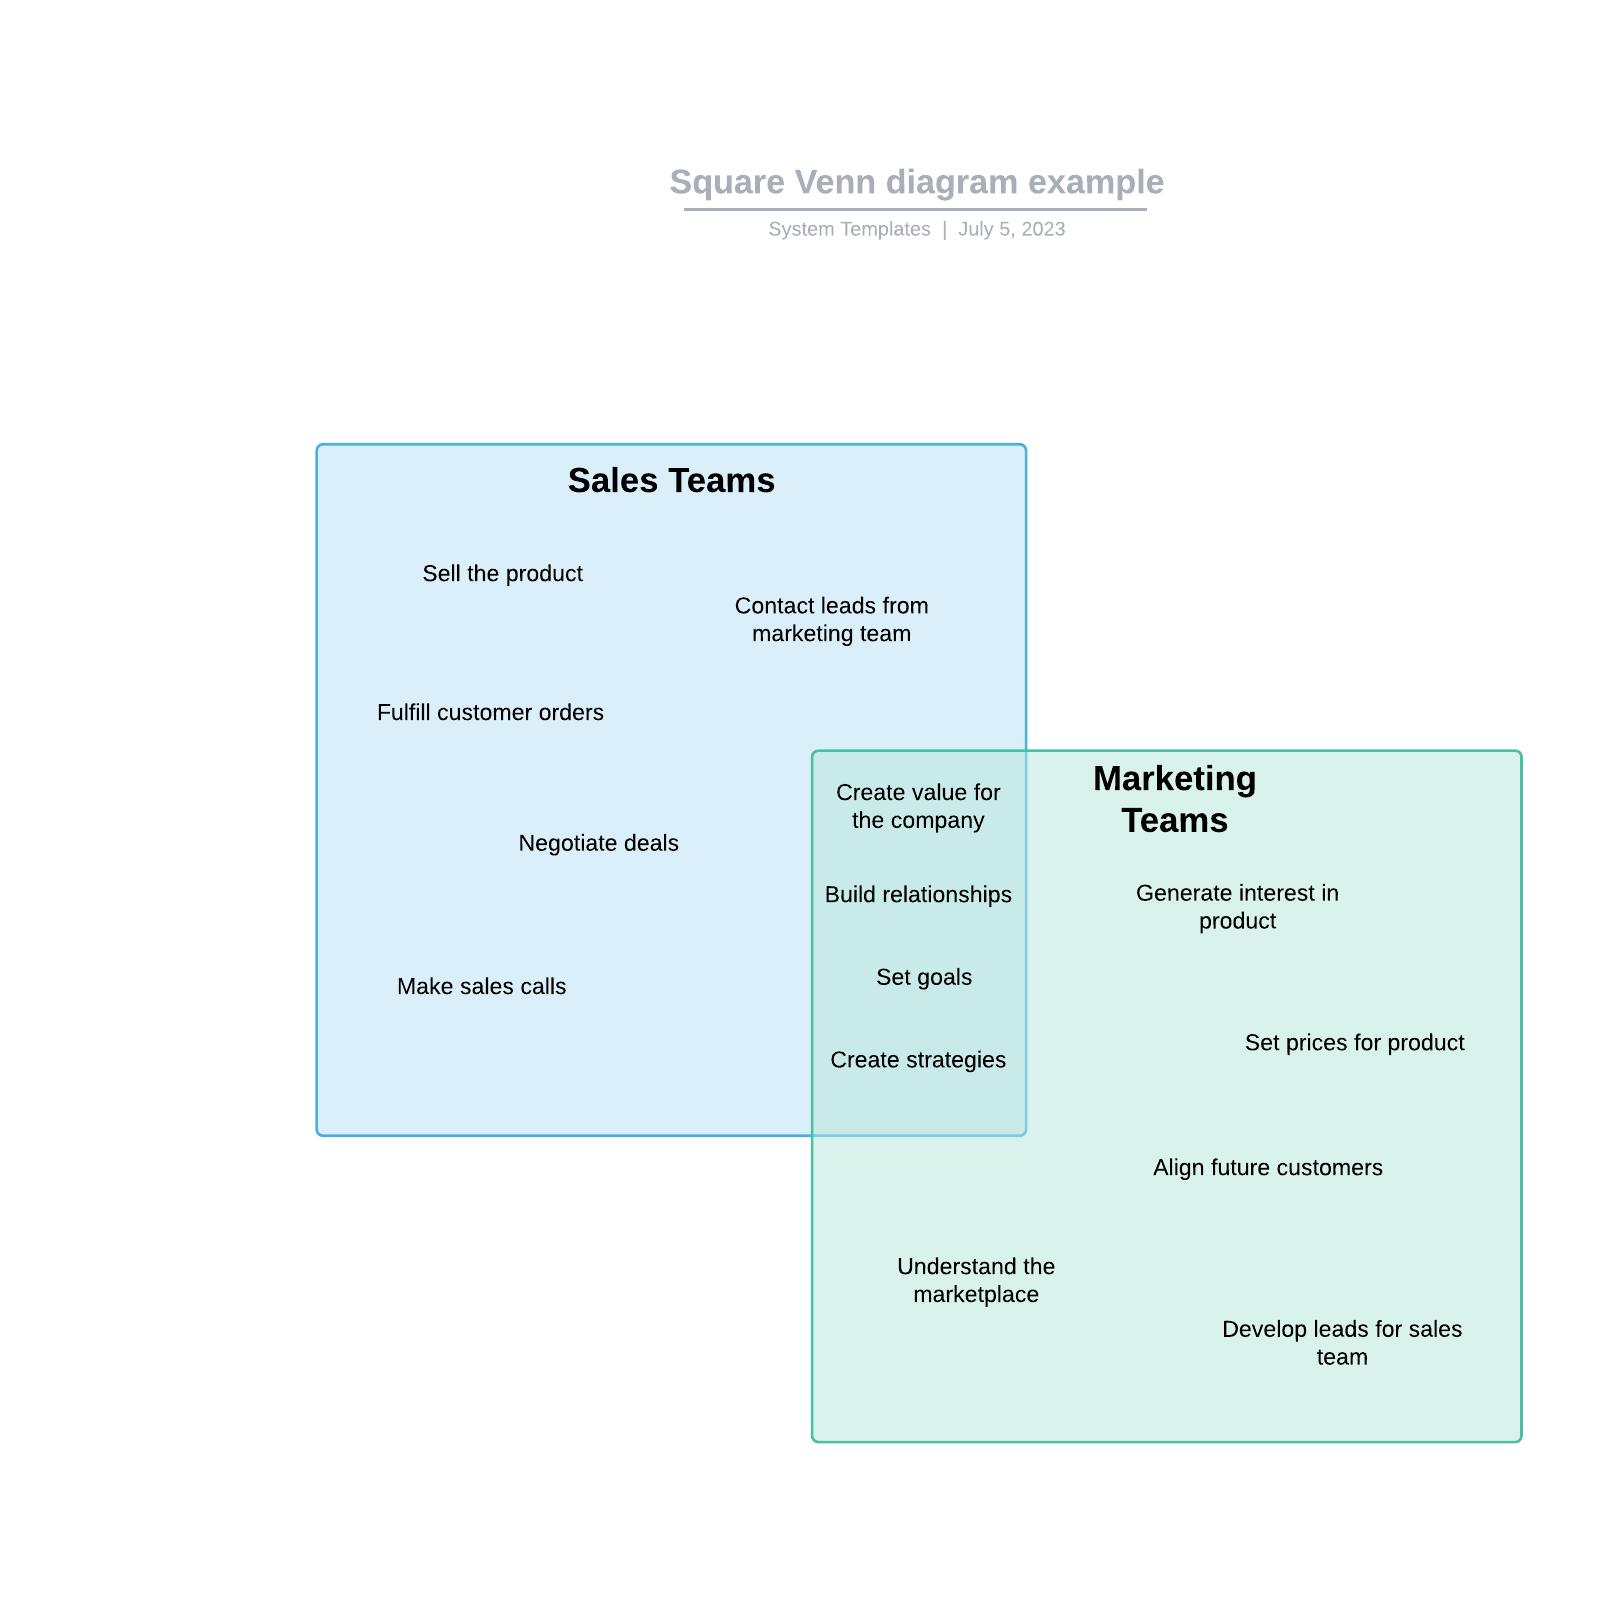 Square Venn diagram example